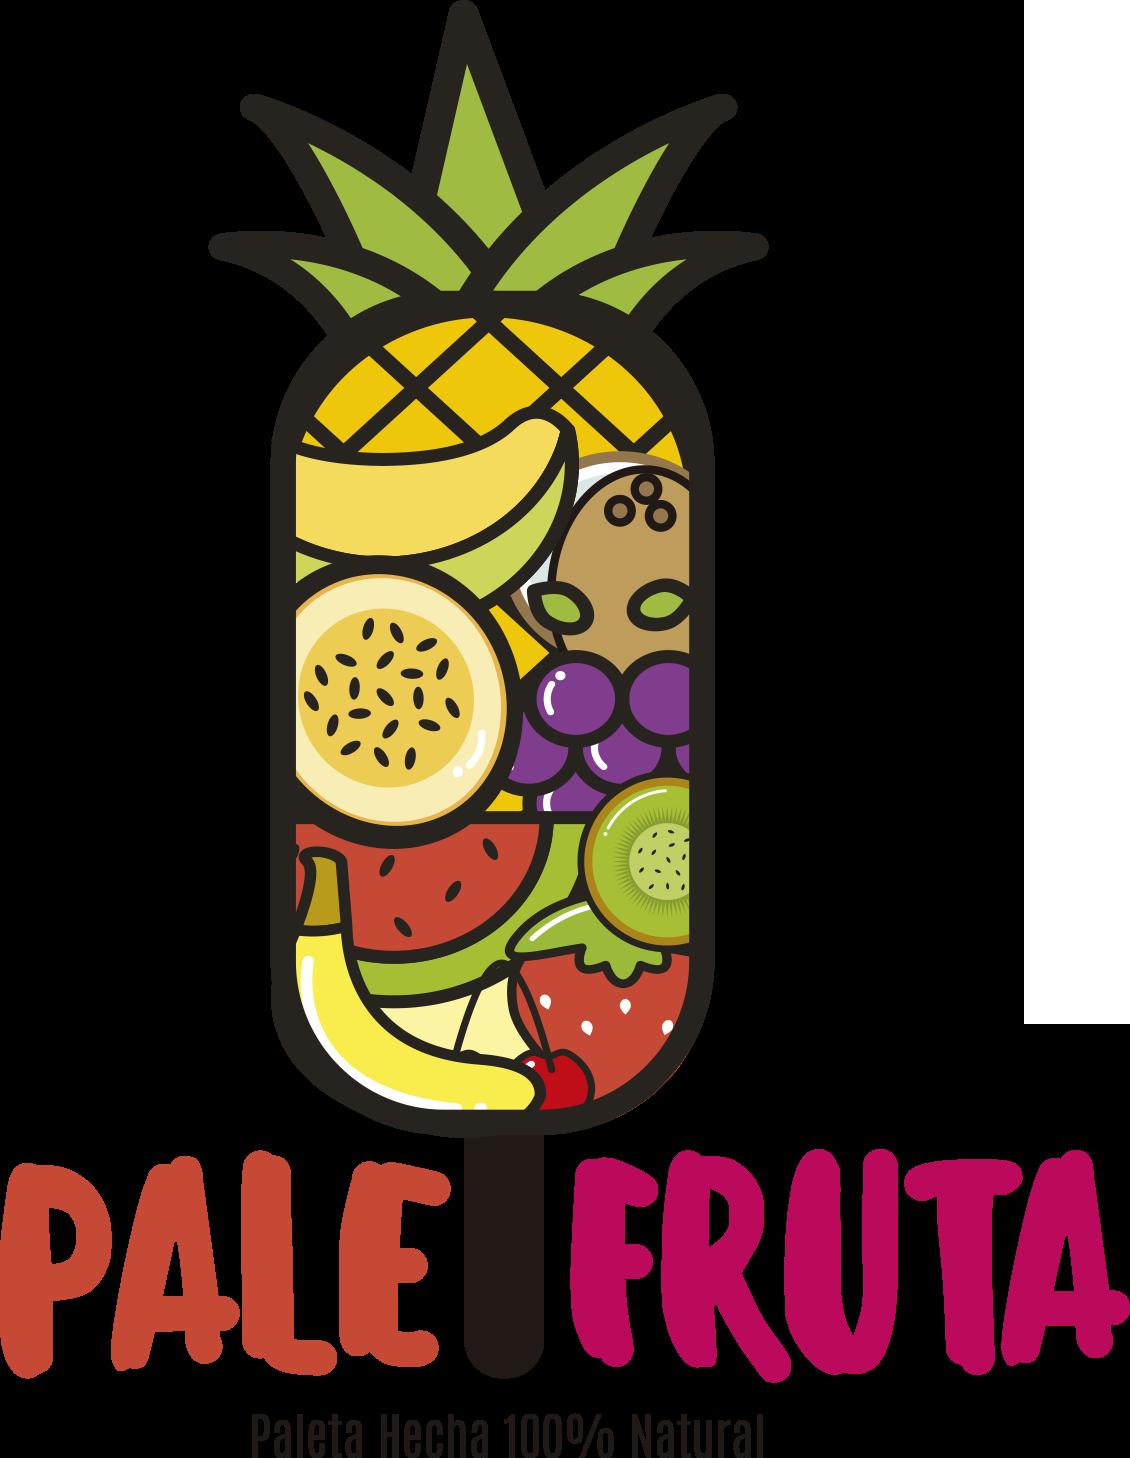 logo palefruta